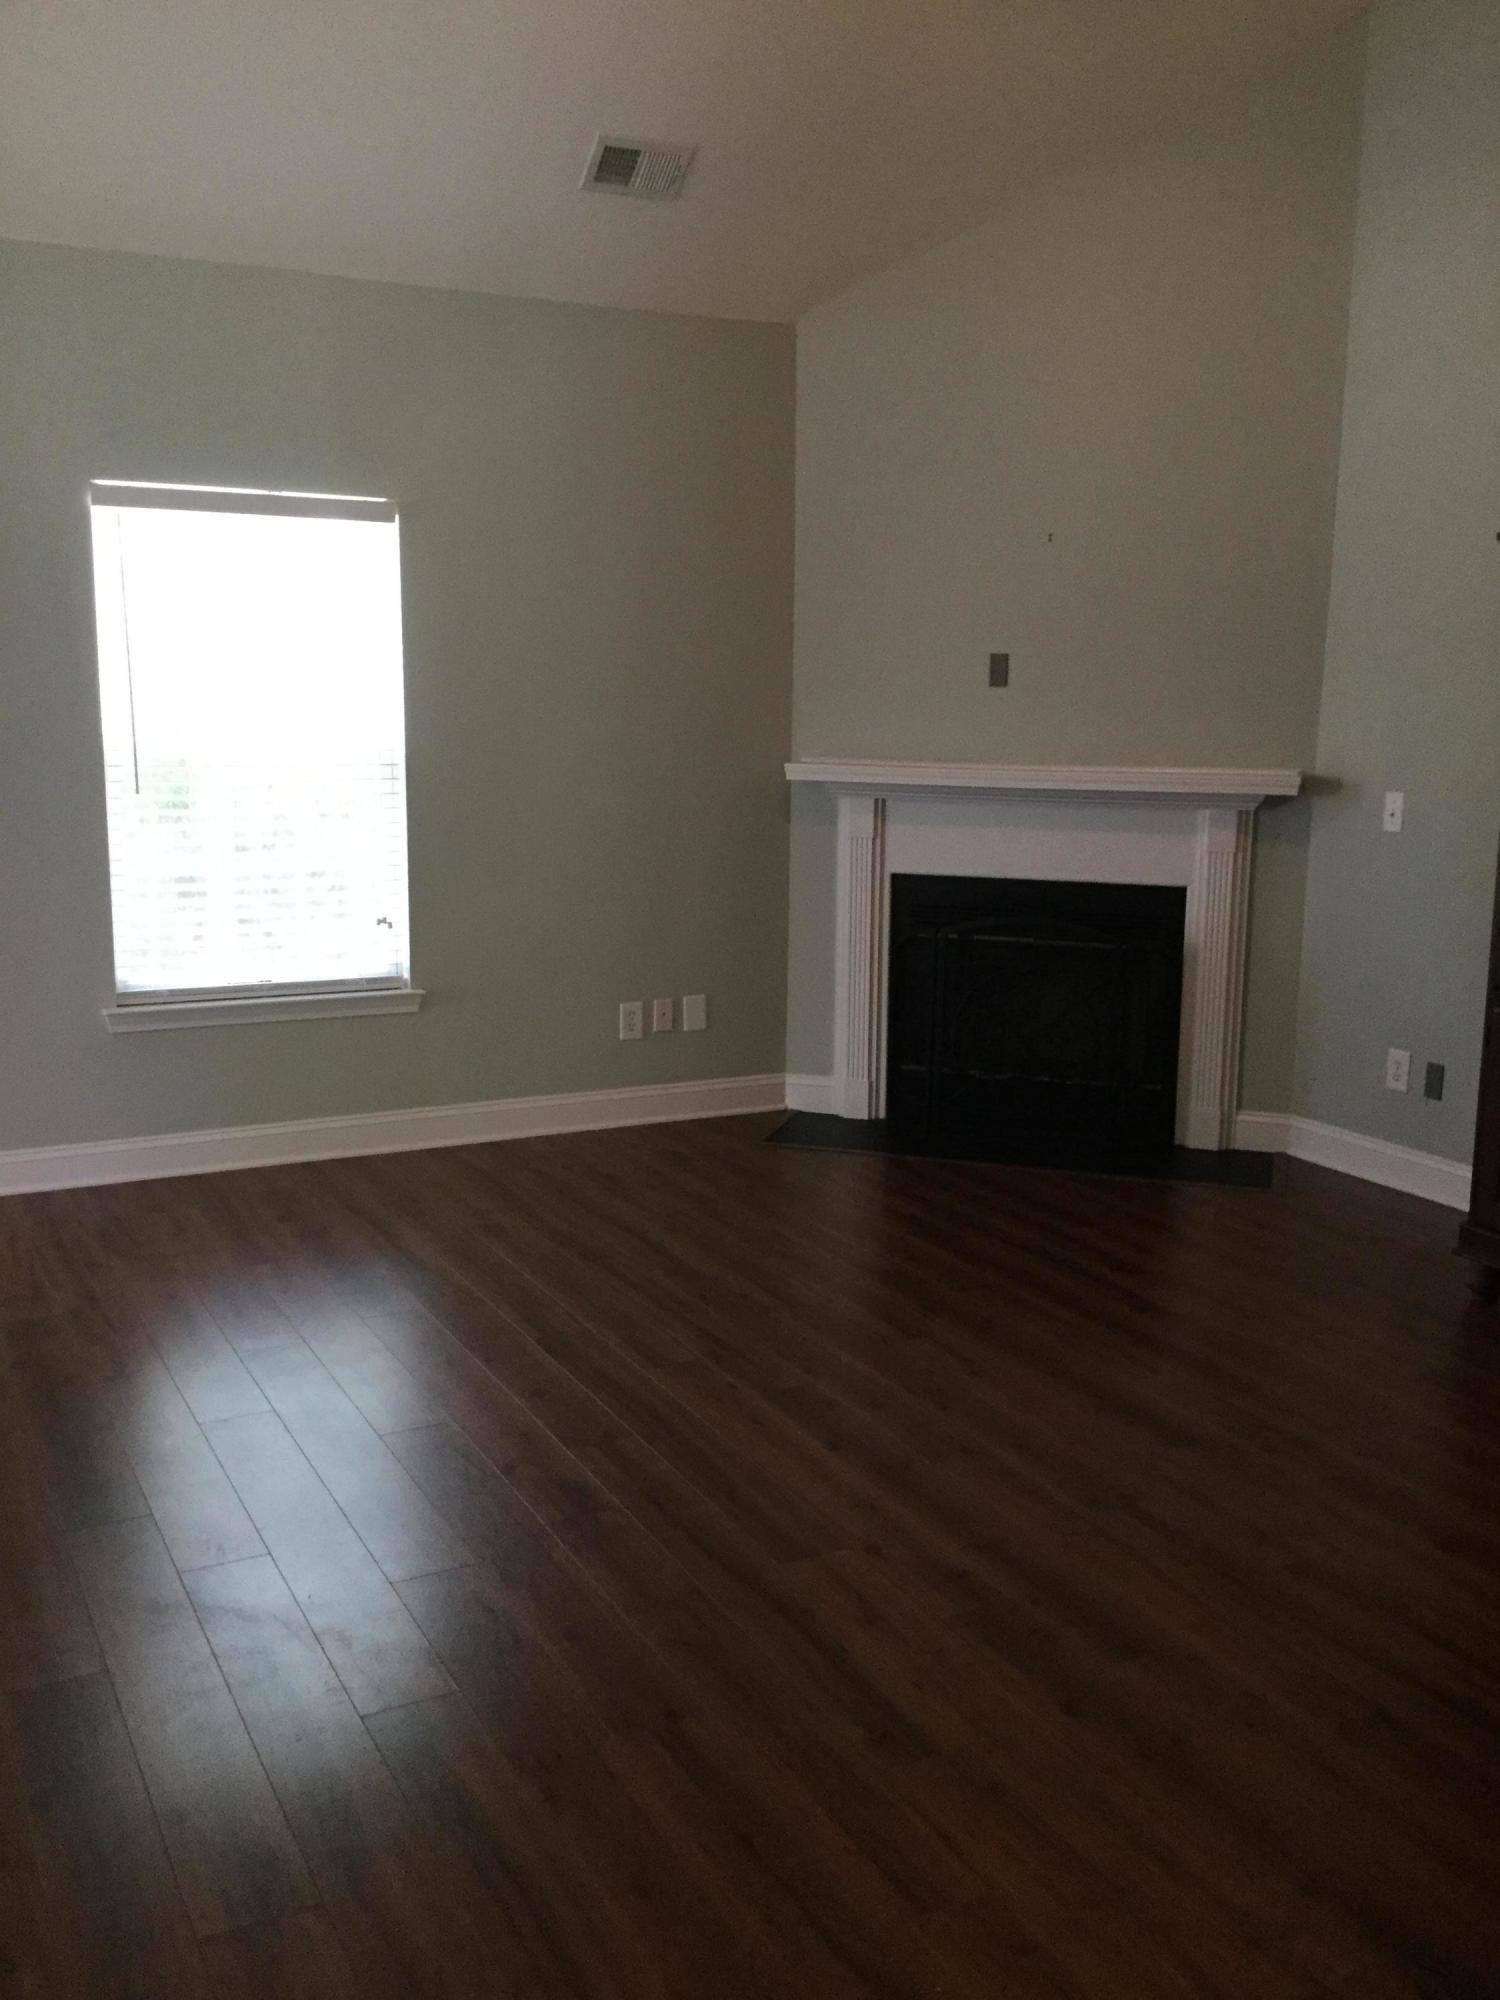 Kennsington Homes For Sale - 122 Heatherlock, Hanahan, SC - 15